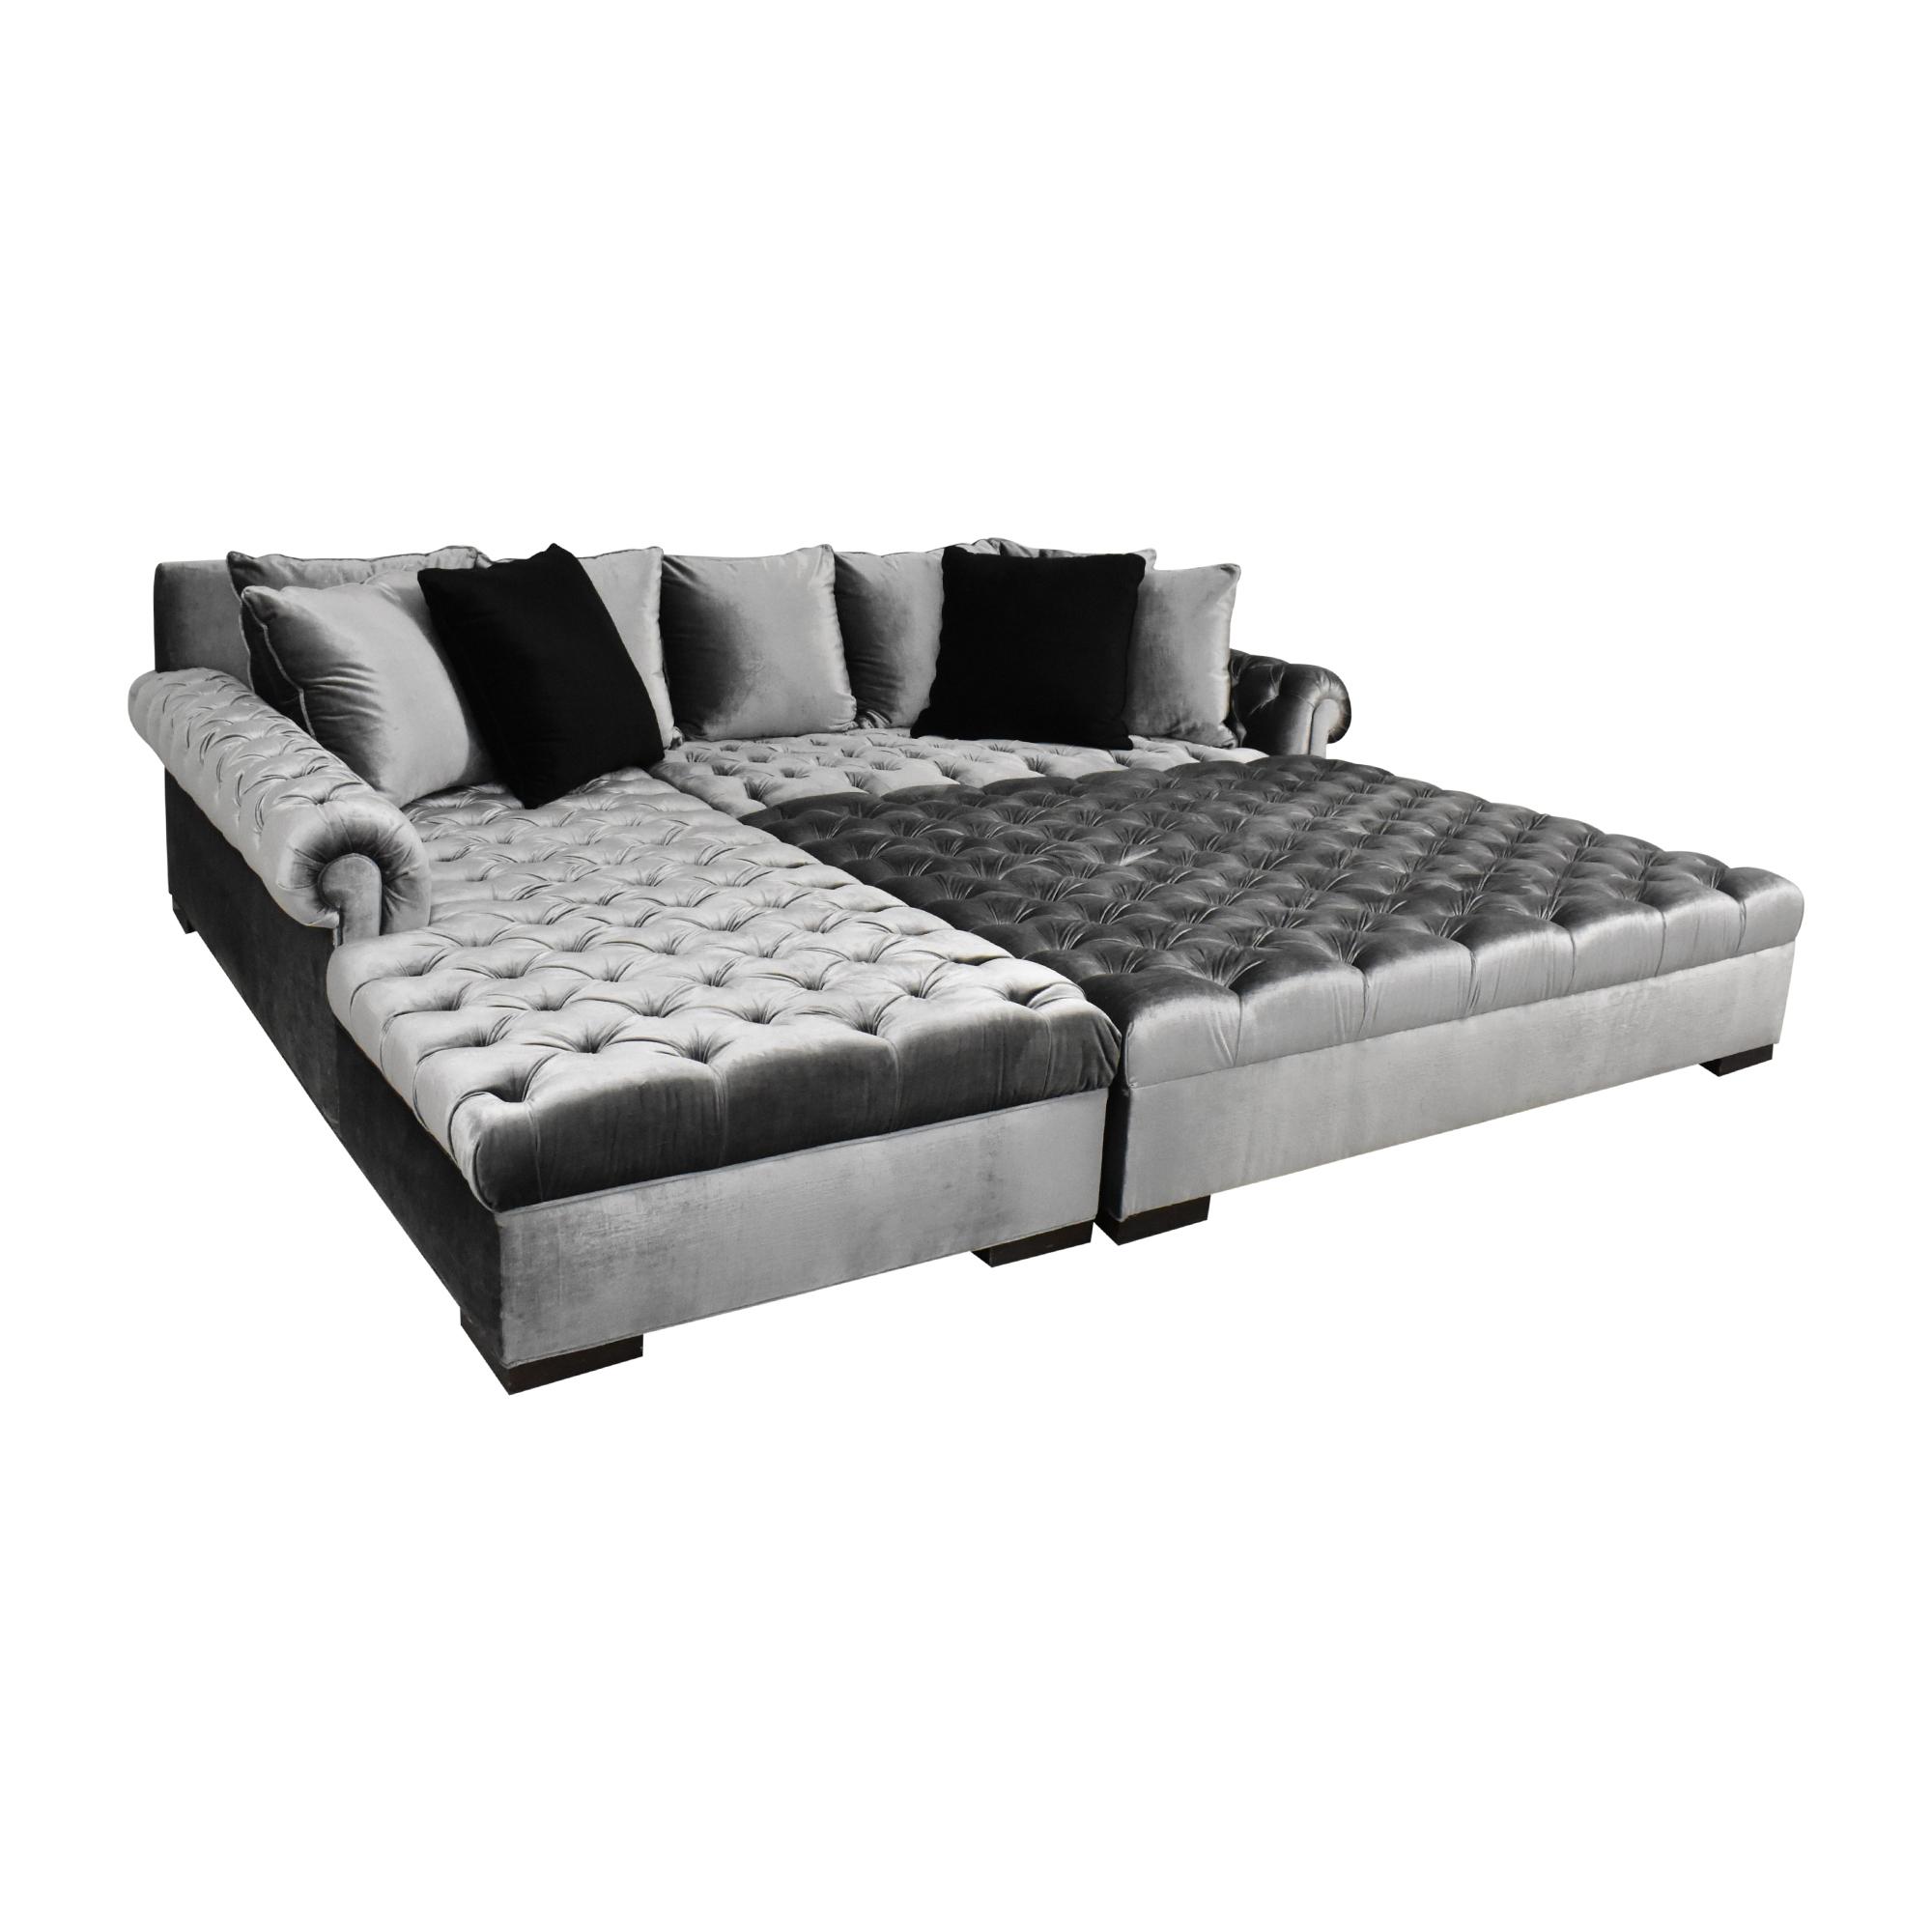 Haute House Haute House Smith Sectional Sofa with Ottoman on sale